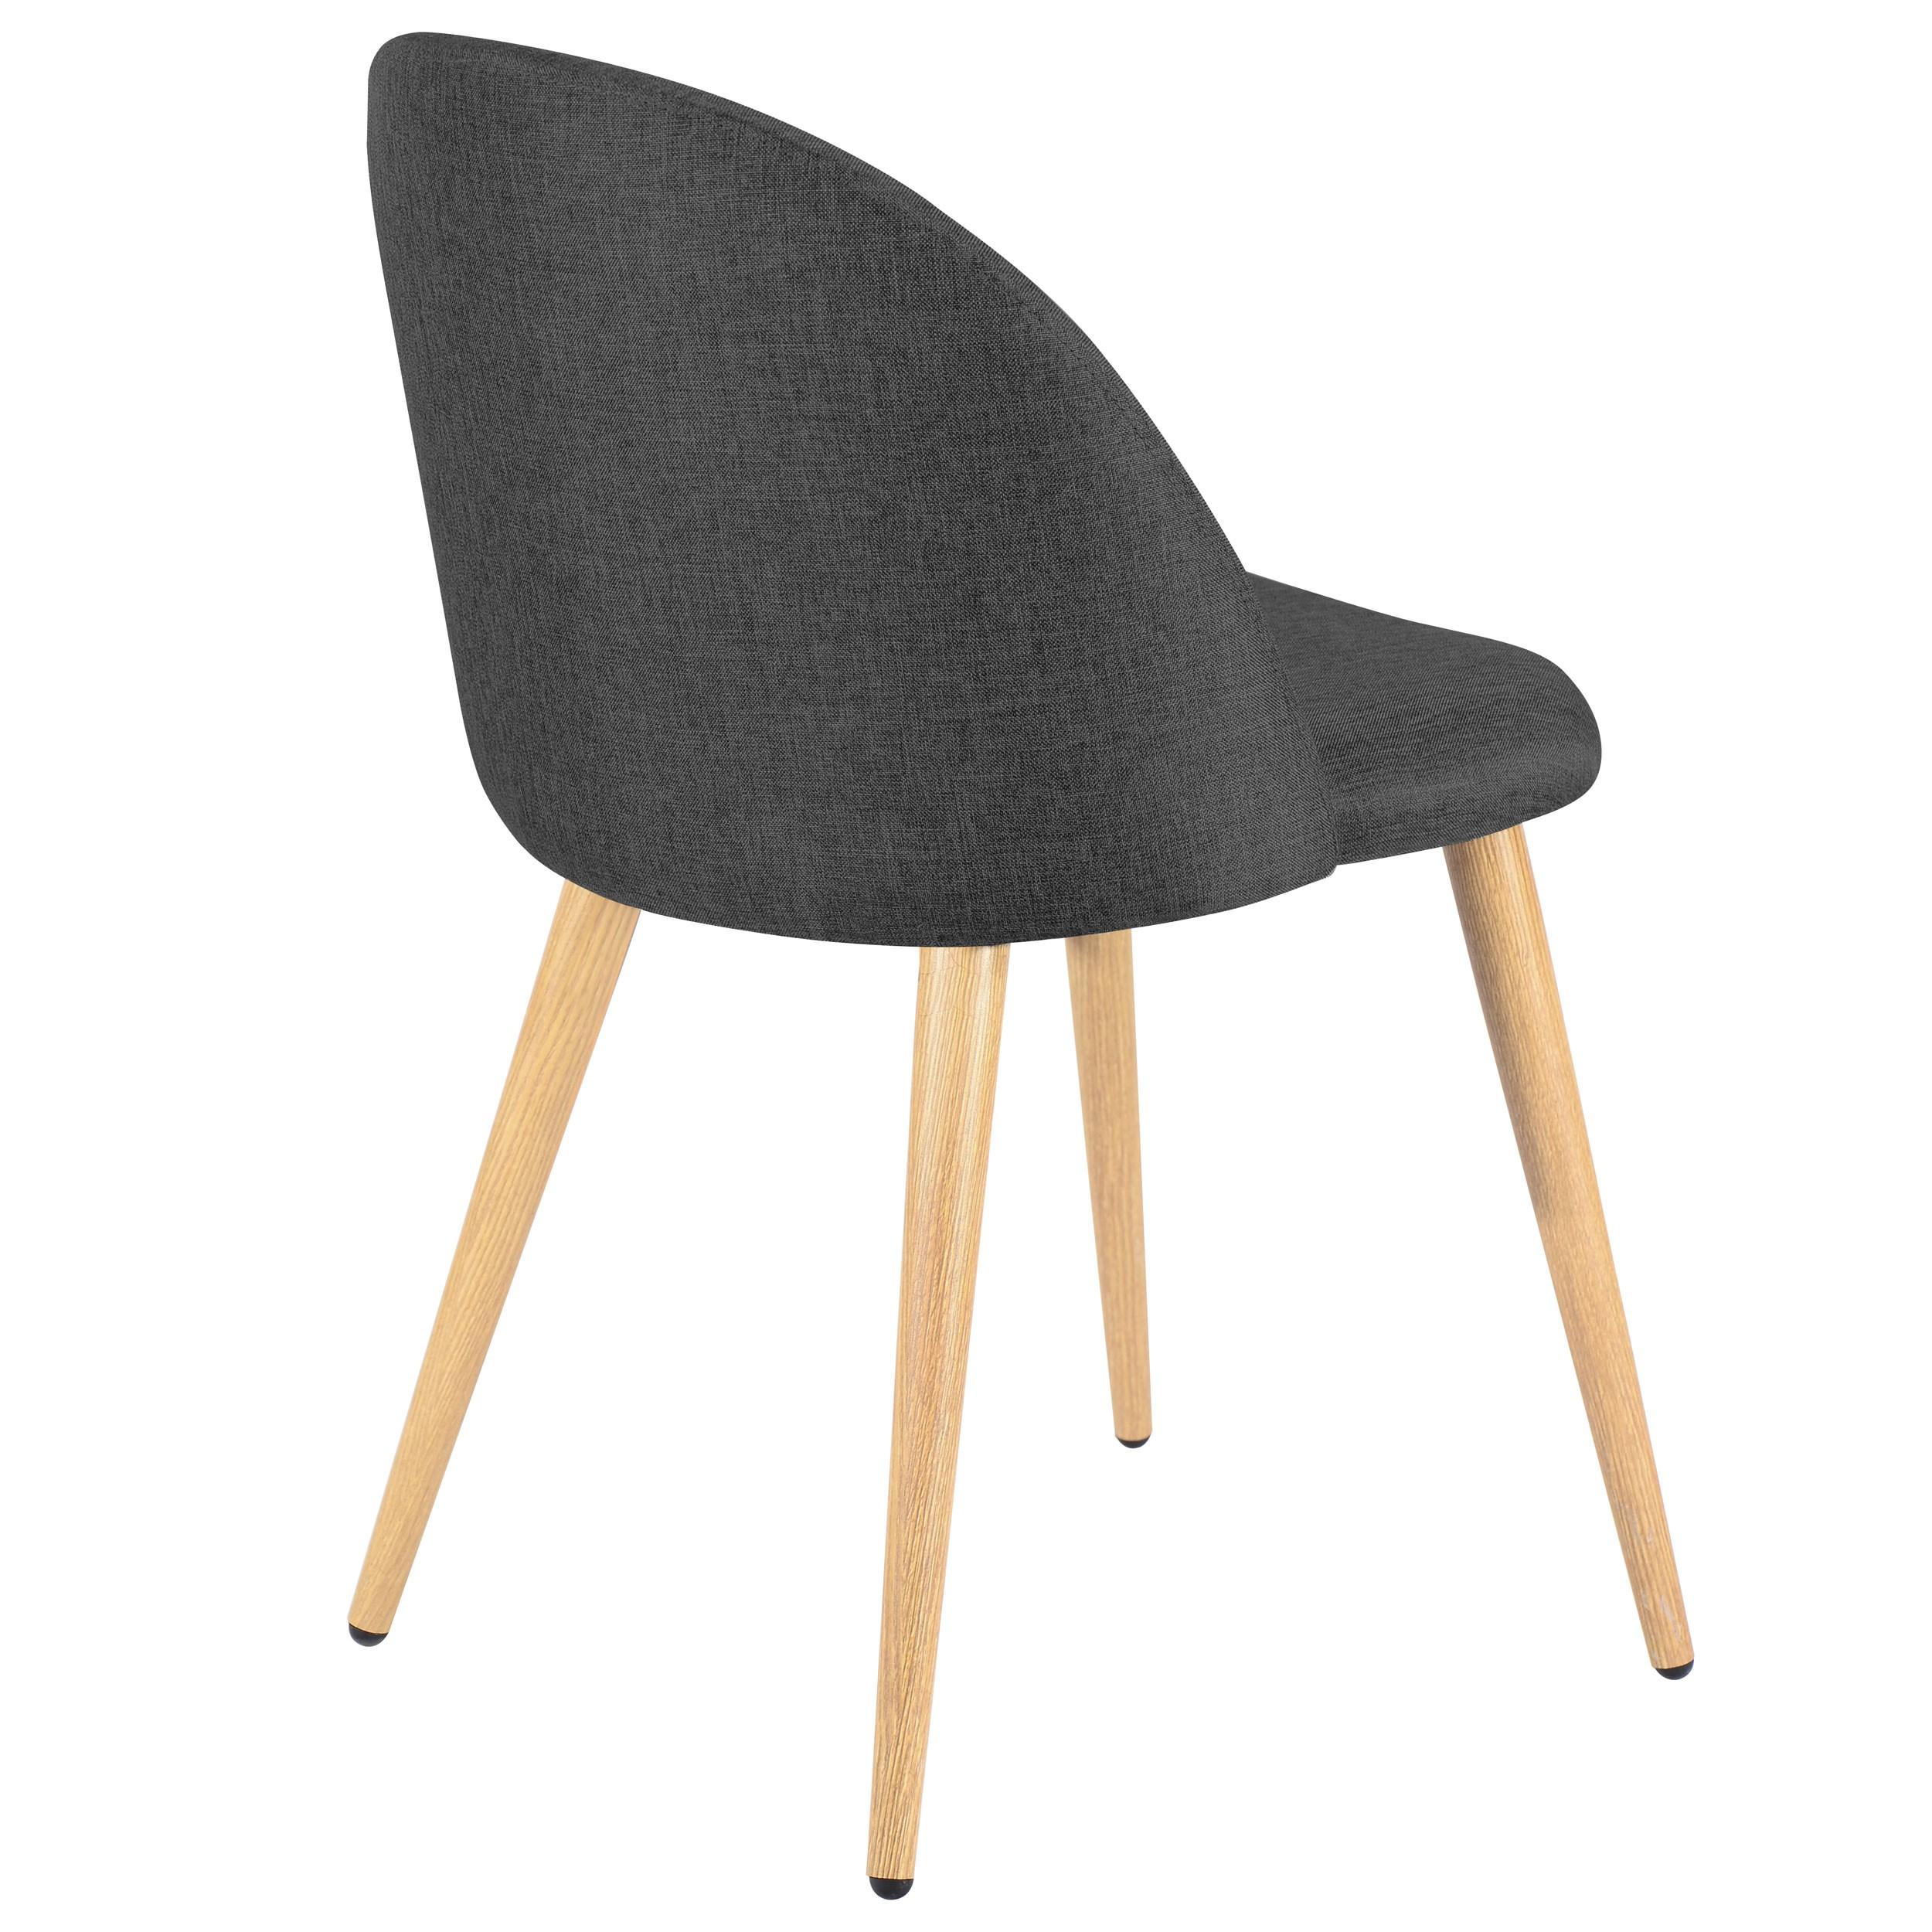 Chaise en tissu interesting chaise en tissu bucura chaise for Chaise noire tissu